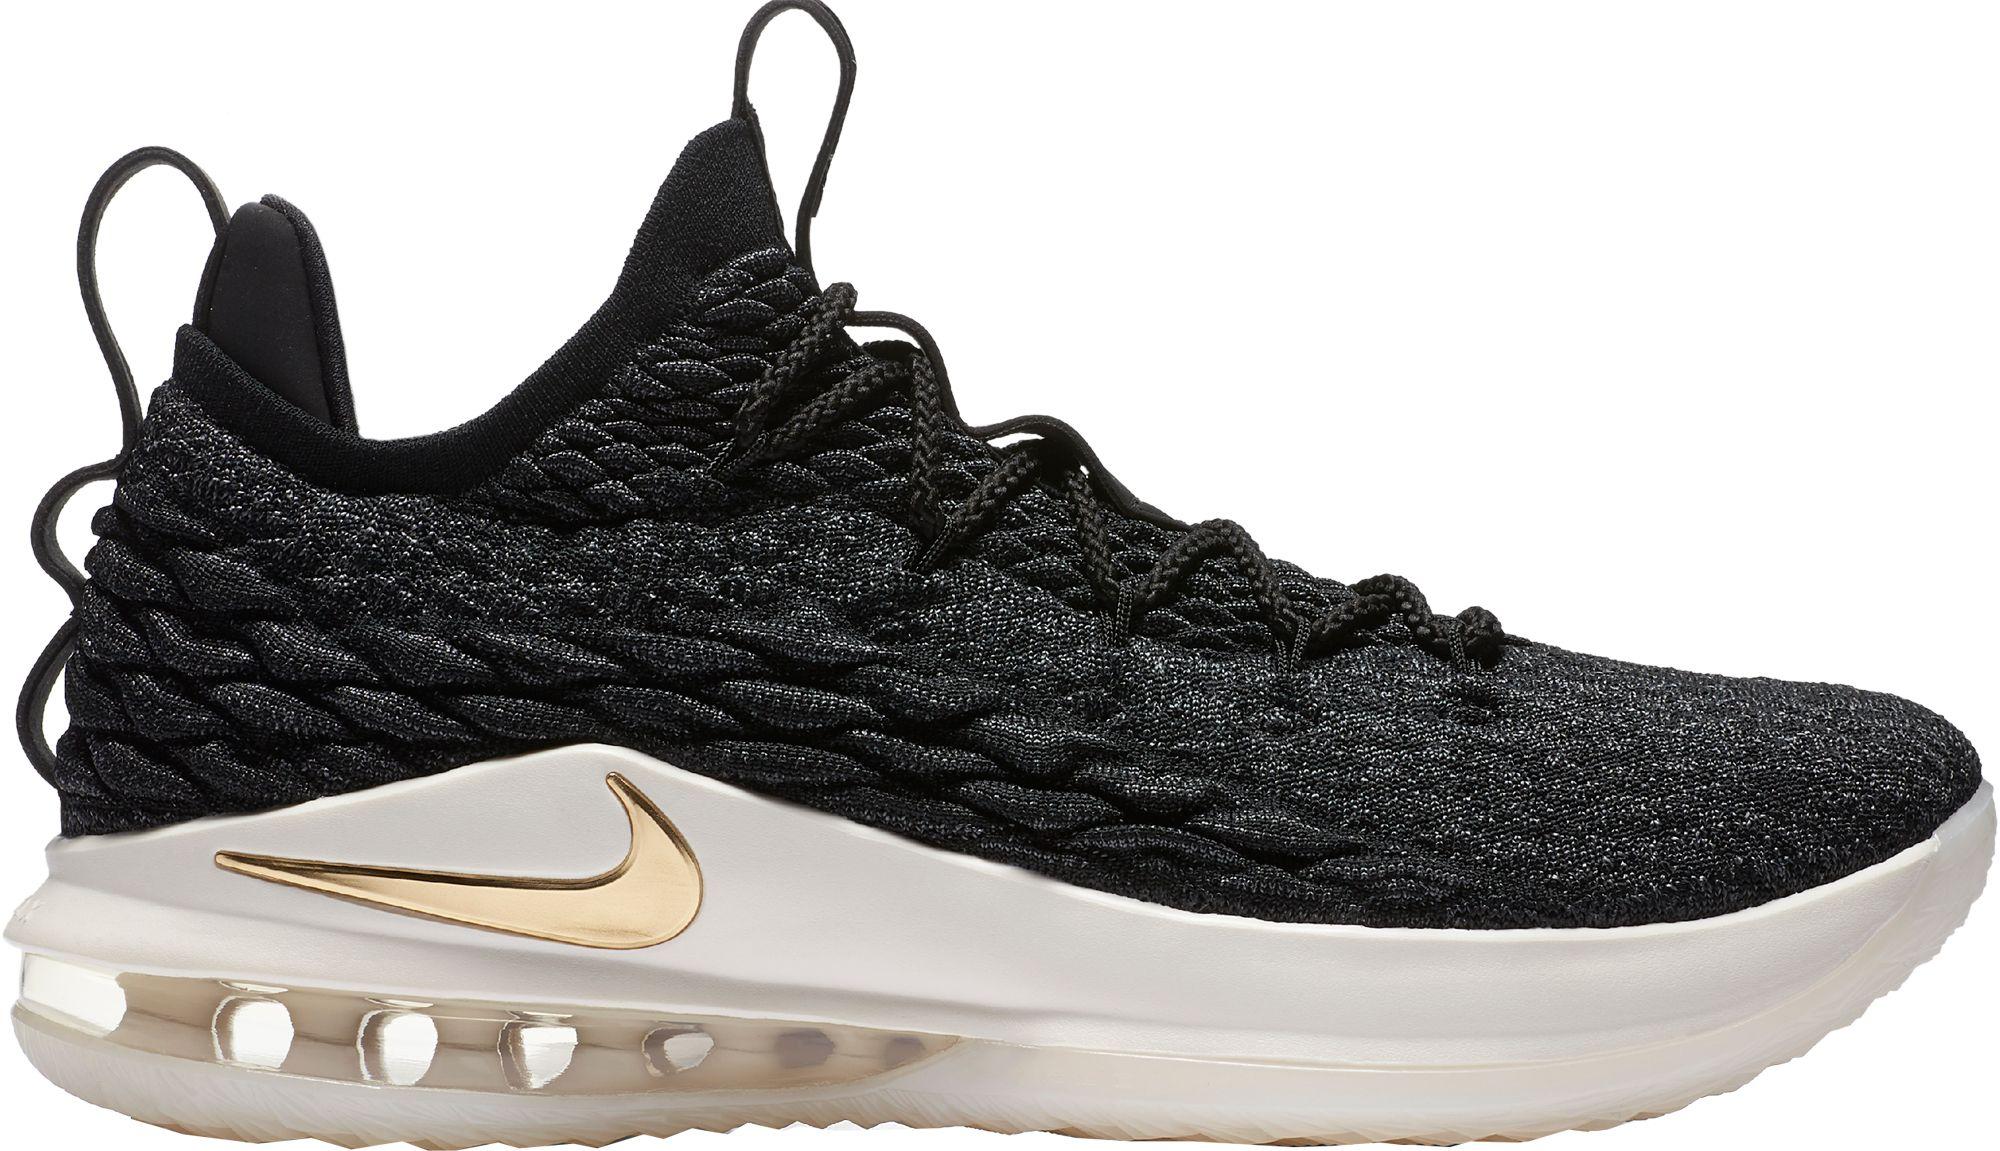 nike lebron 15 low basketball shoes dick s sporting goods rh dickssportinggoods com